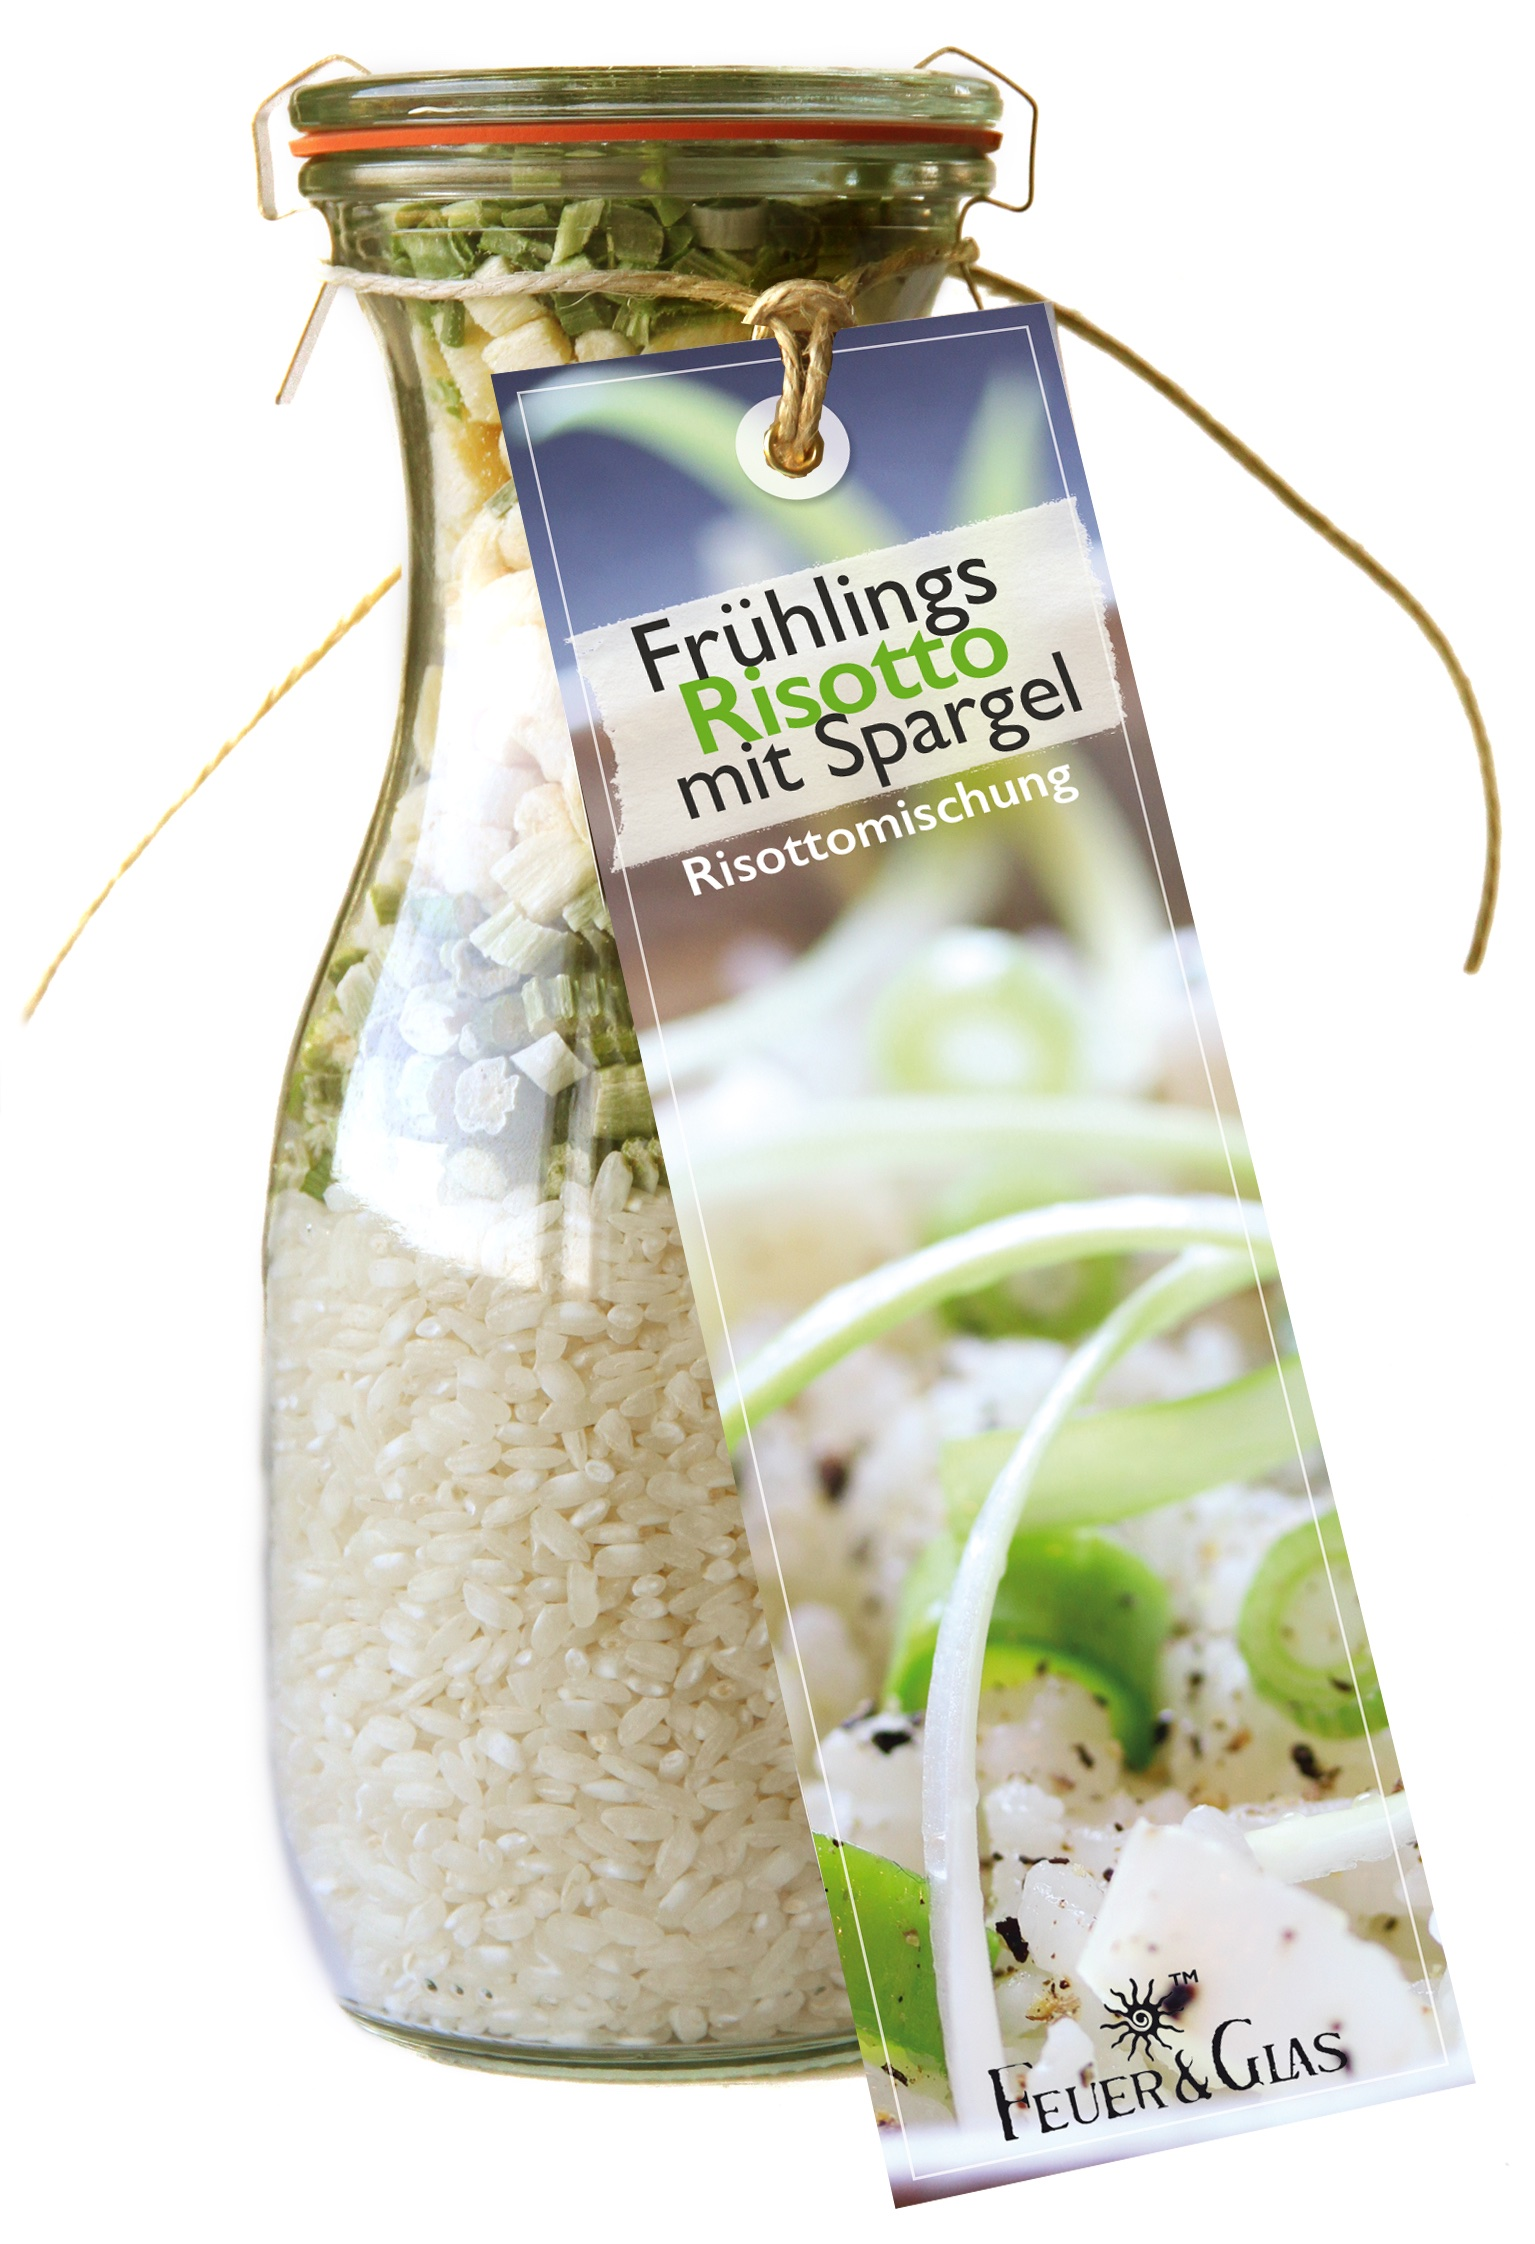 Frühlings Risotto mit Spargel    Mini ( 250 ml)